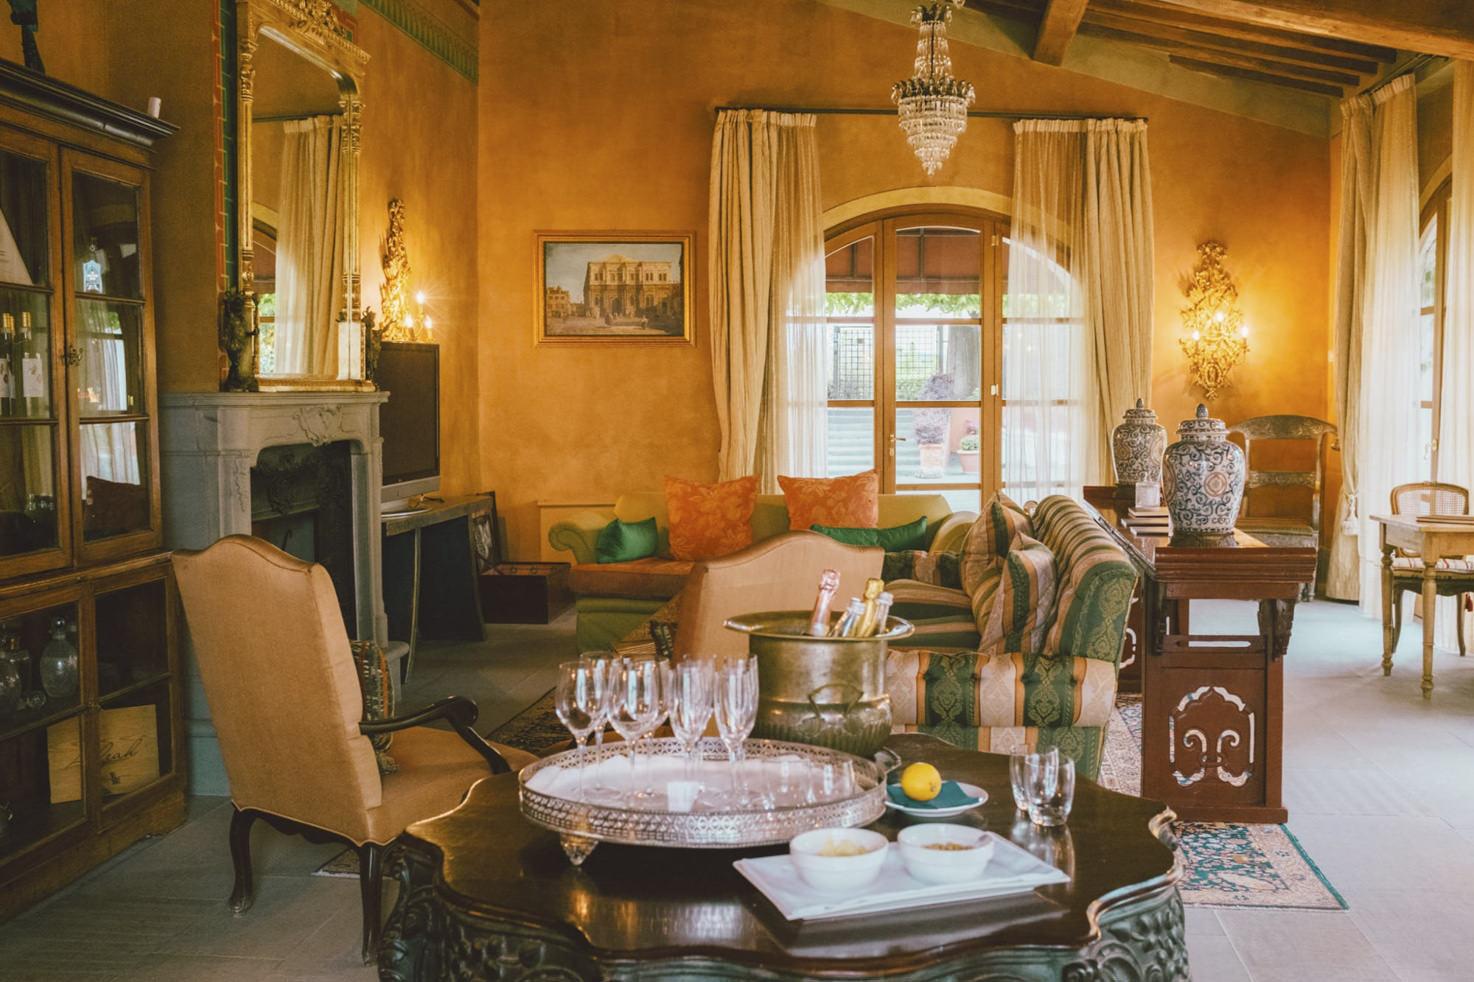 Reception of Villa Mazzei